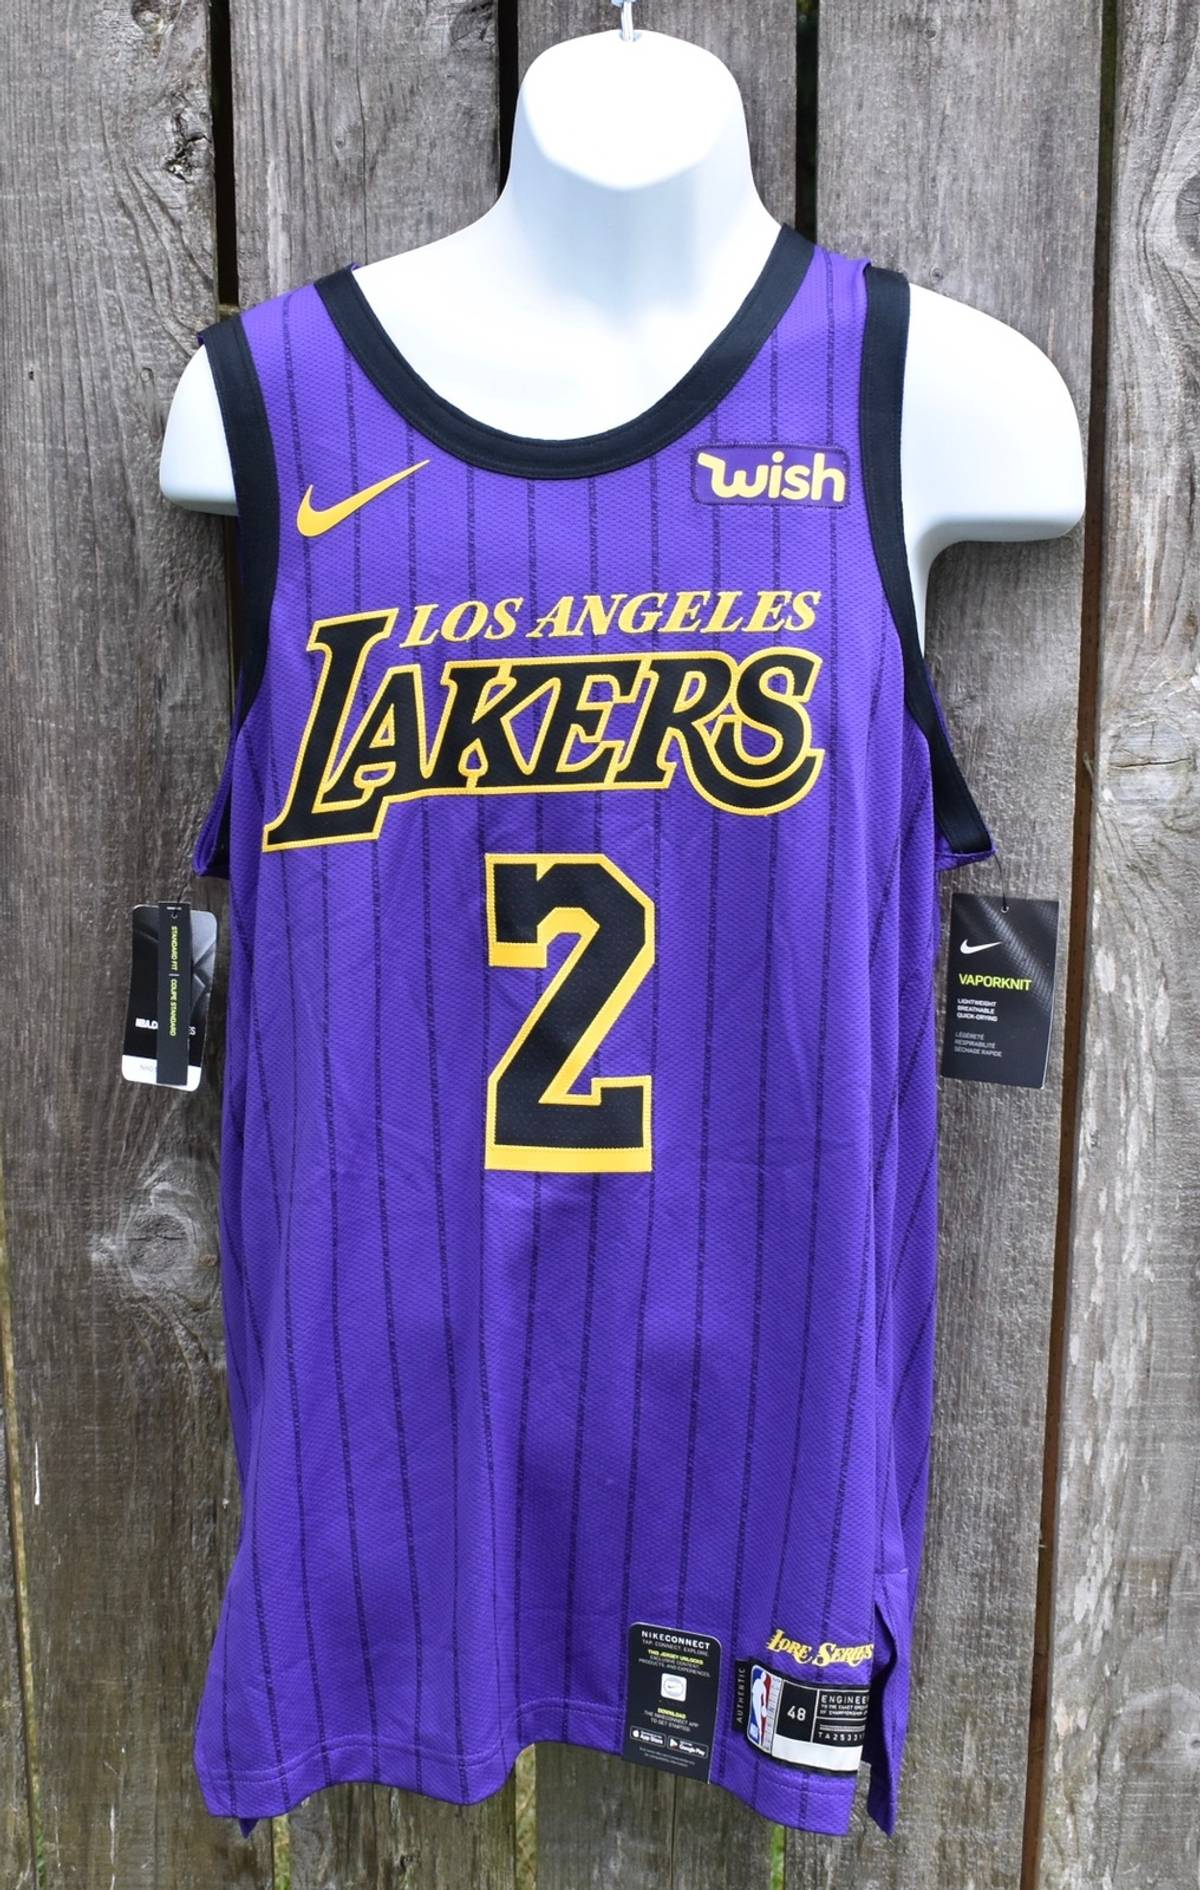 competitive price 3b051 a7db4 L.A. Lakers × Nike Lonzo Ball La Lakers Nike Connect Lake Show Jersey Size  L $25